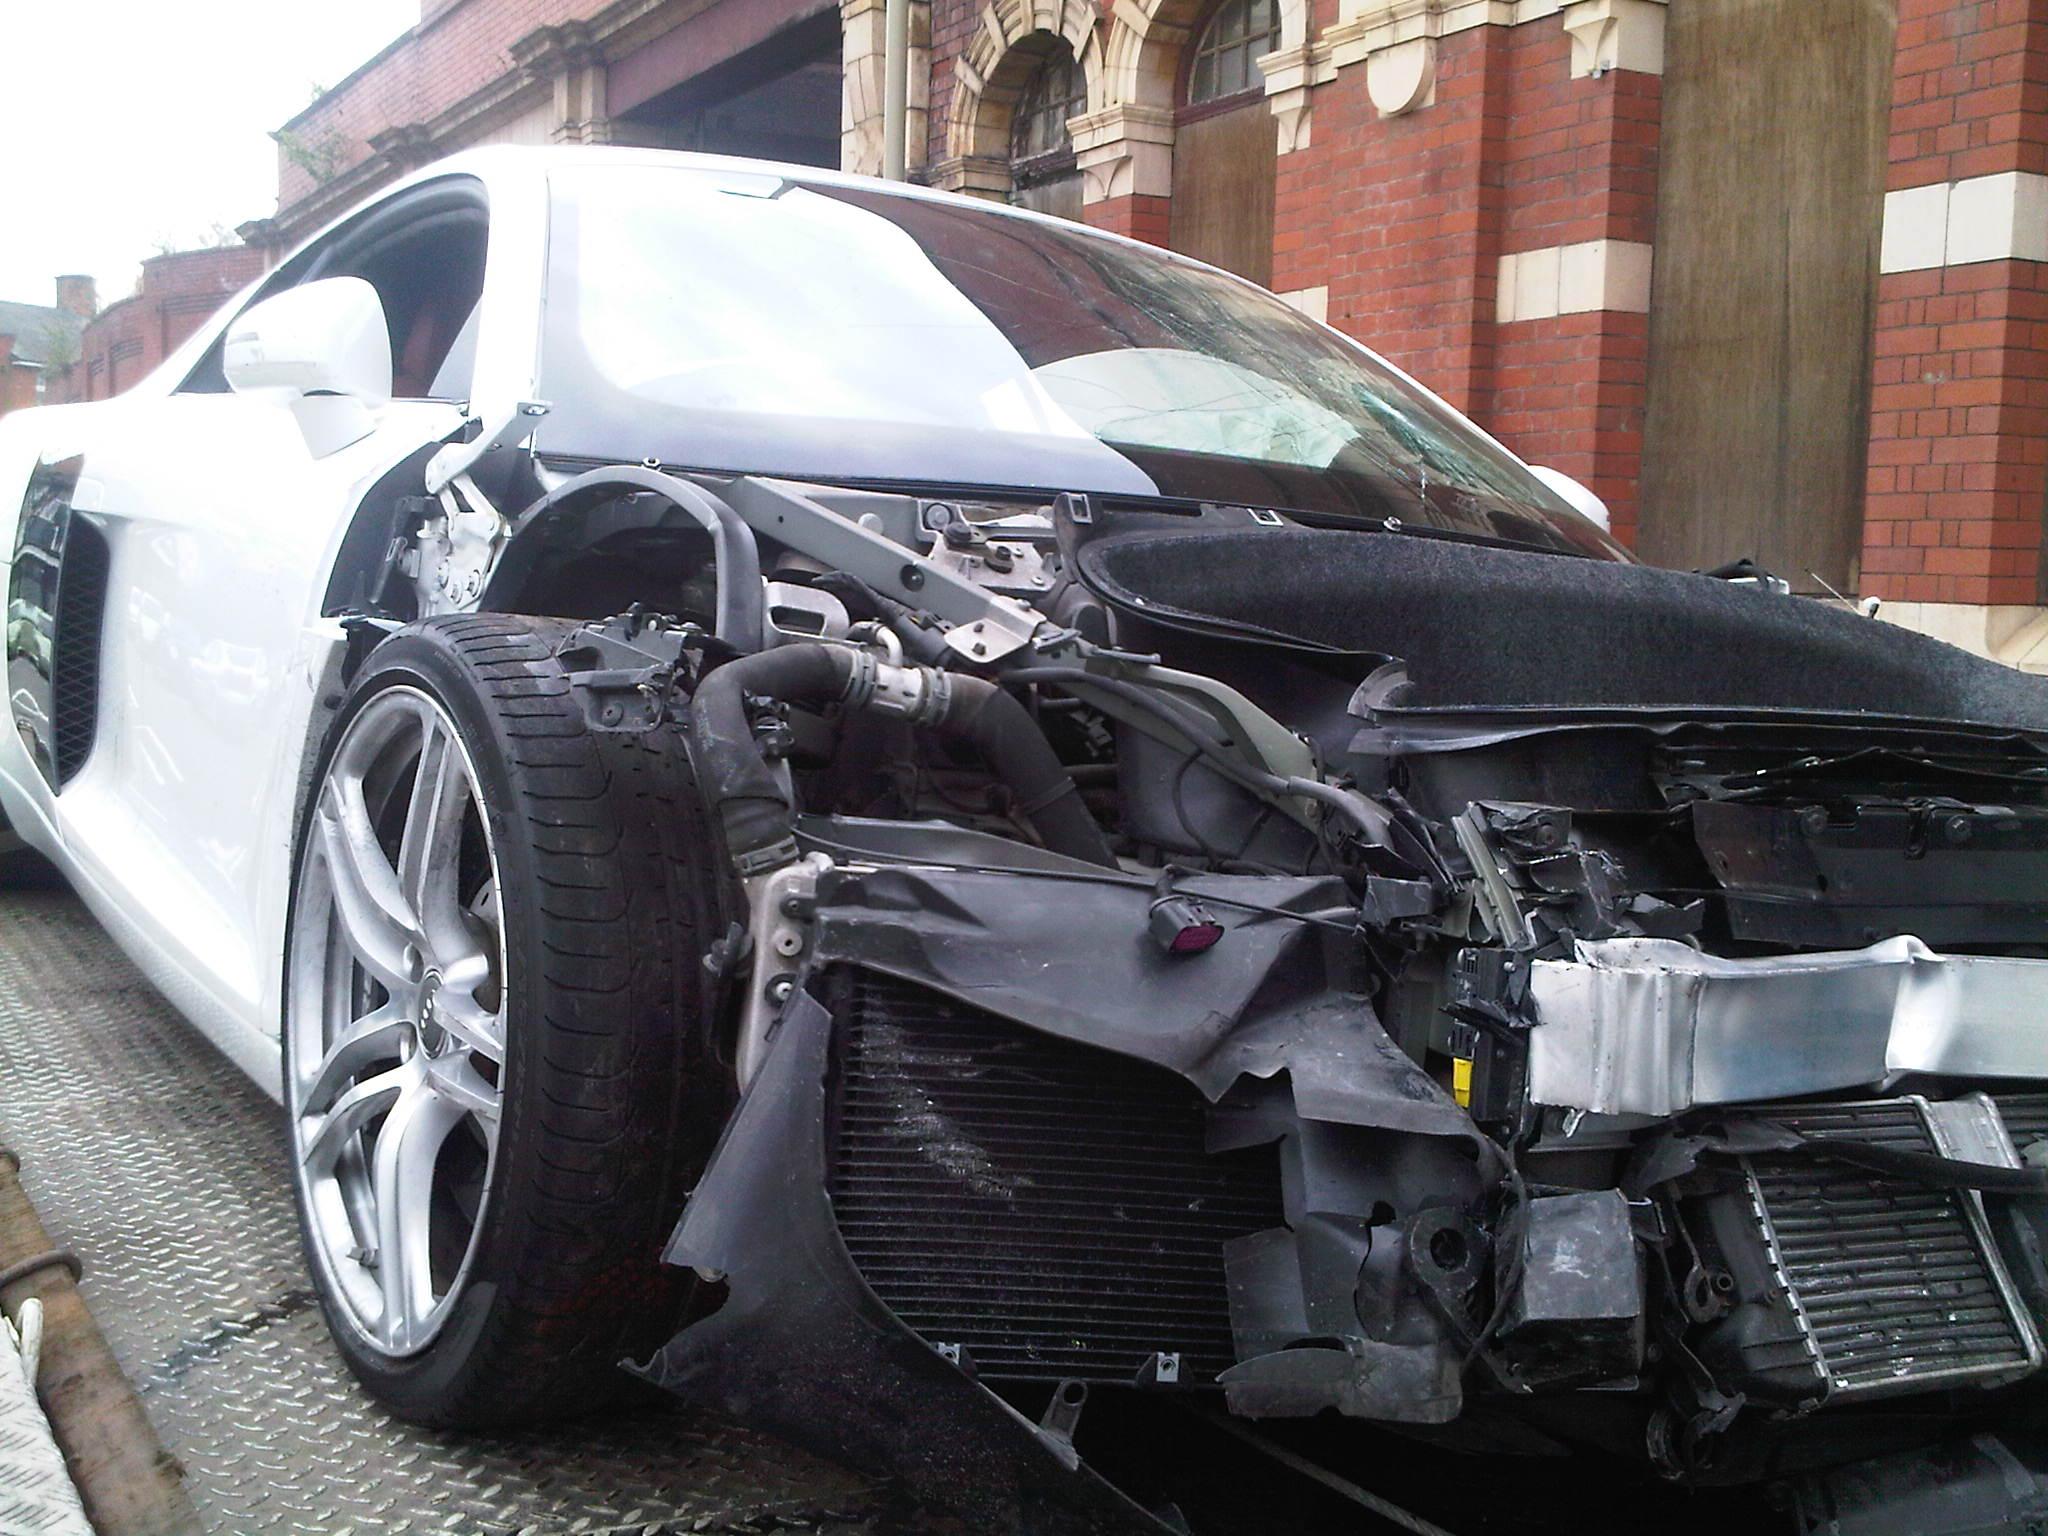 car-recovery-birmingham-damaged-1